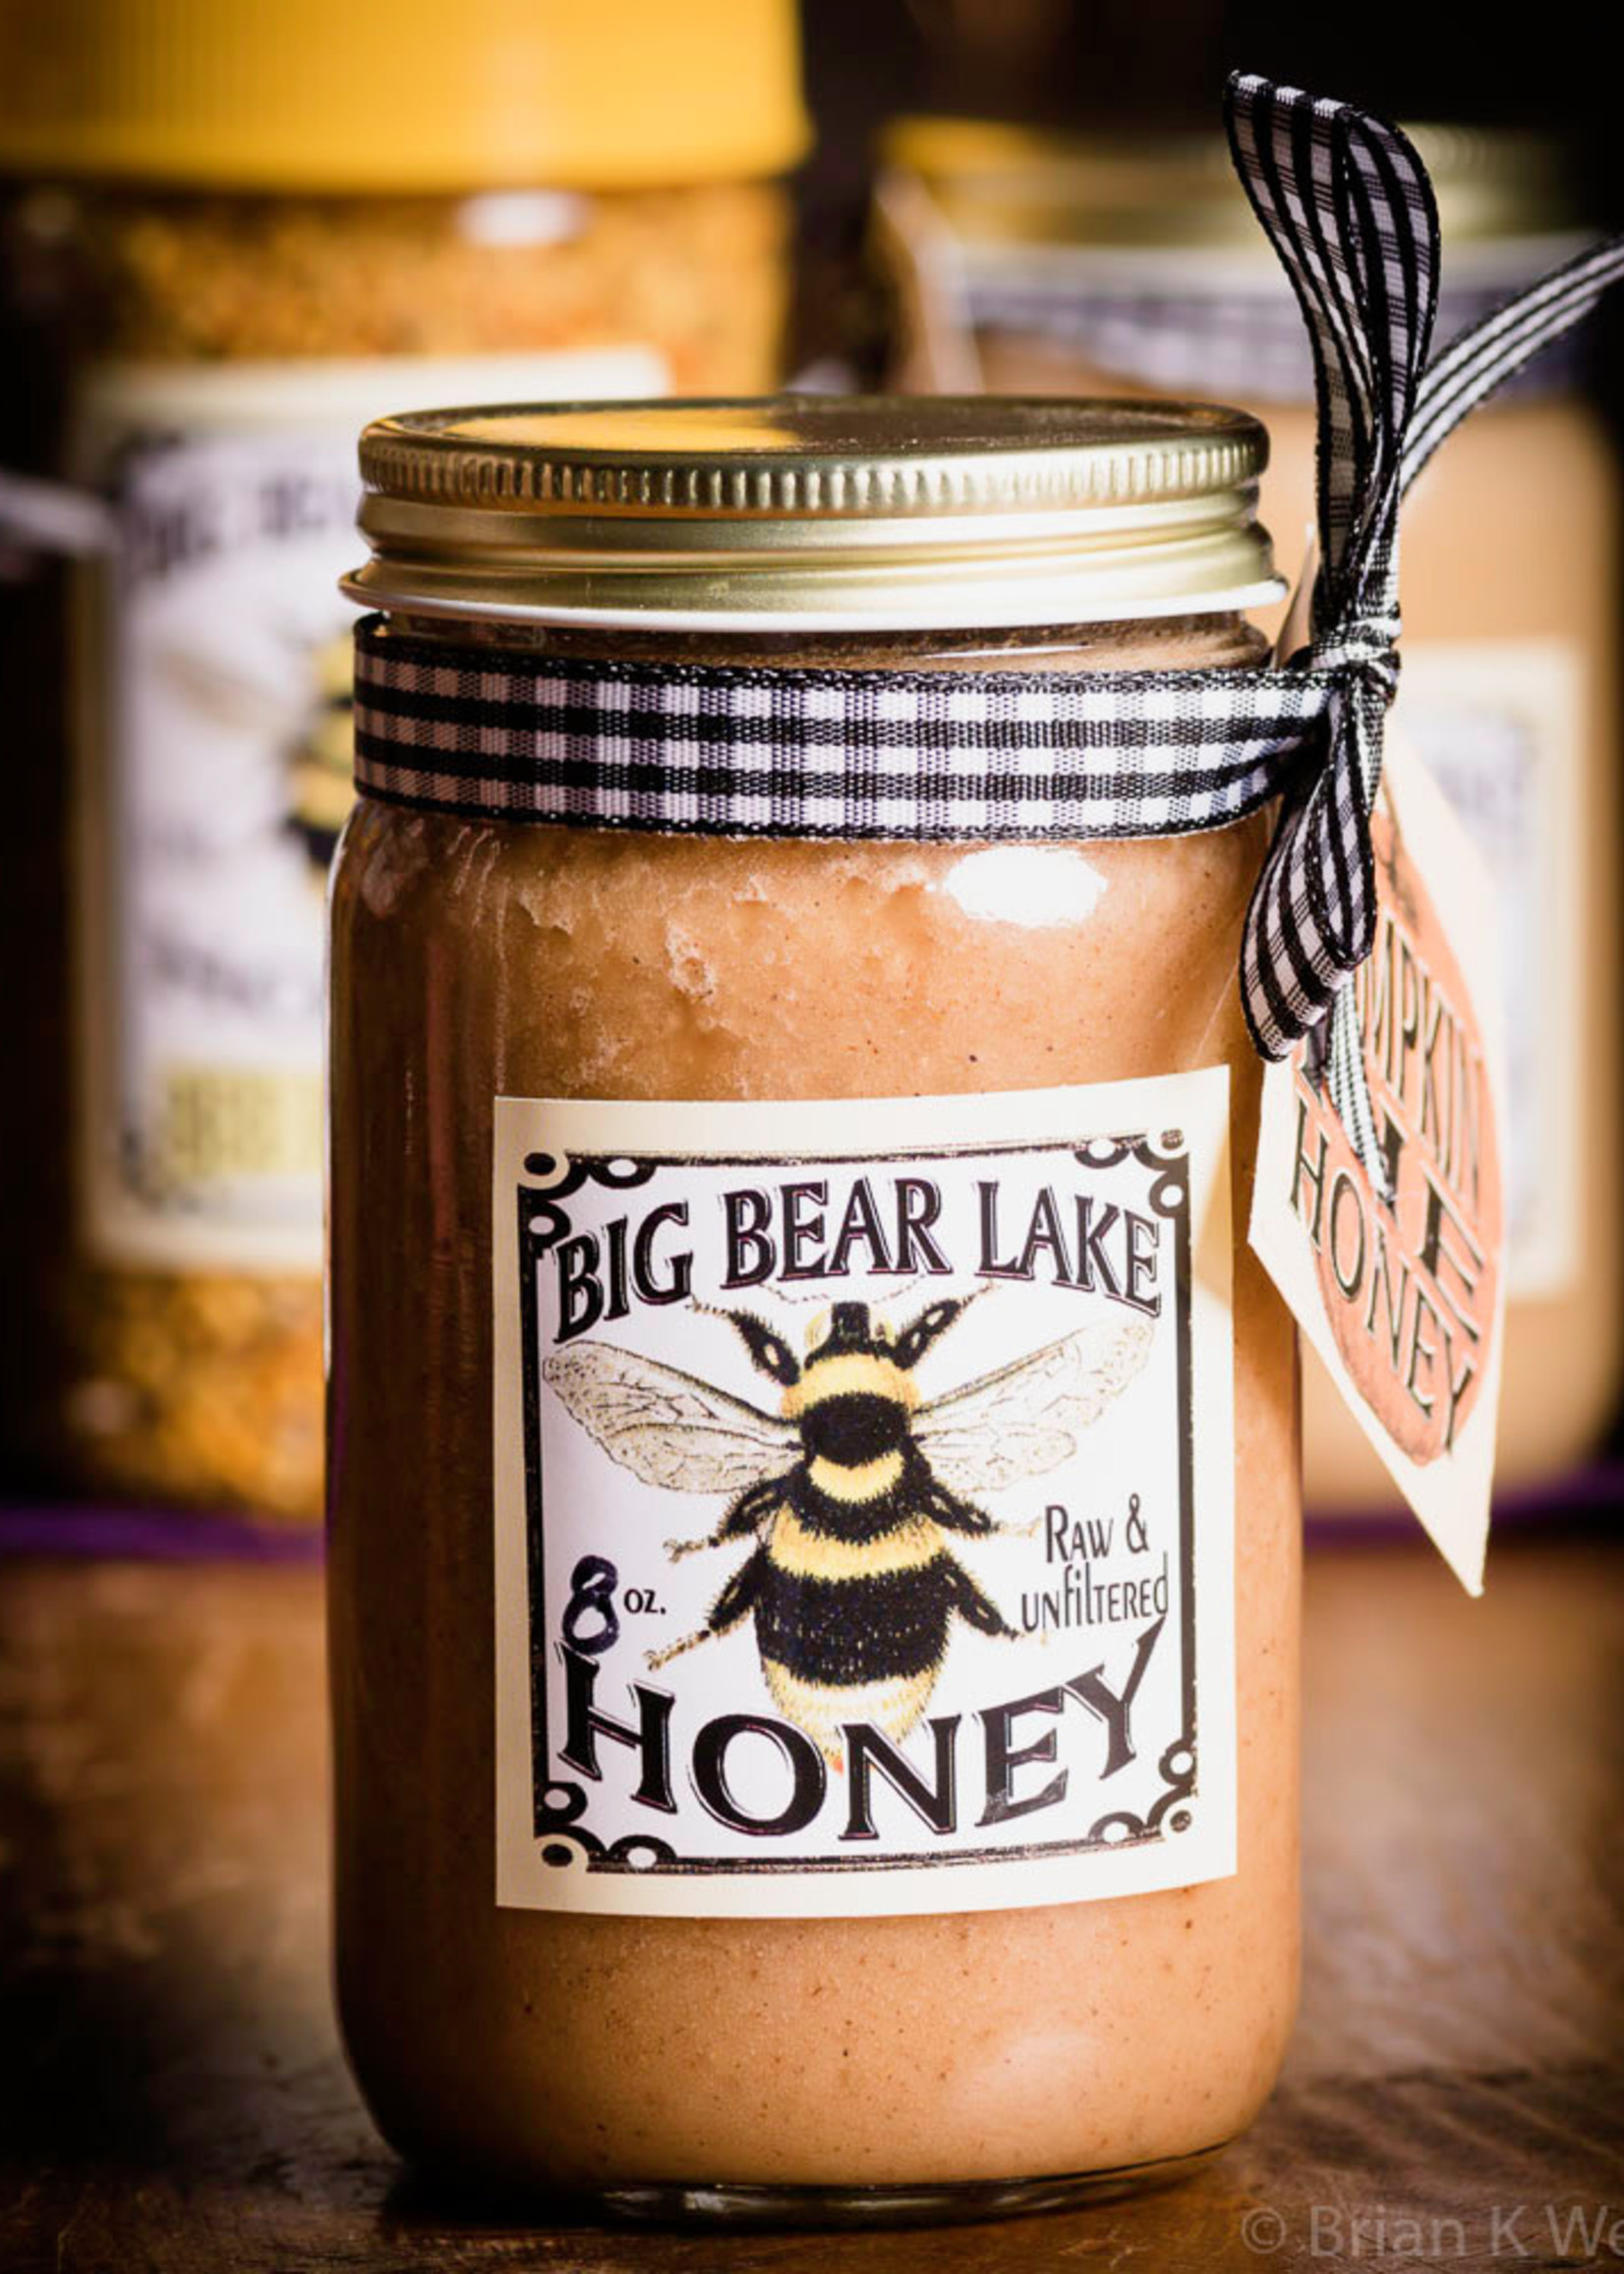 Big Bear Lake Honey Co Honey Wildflower Jar 8 oz